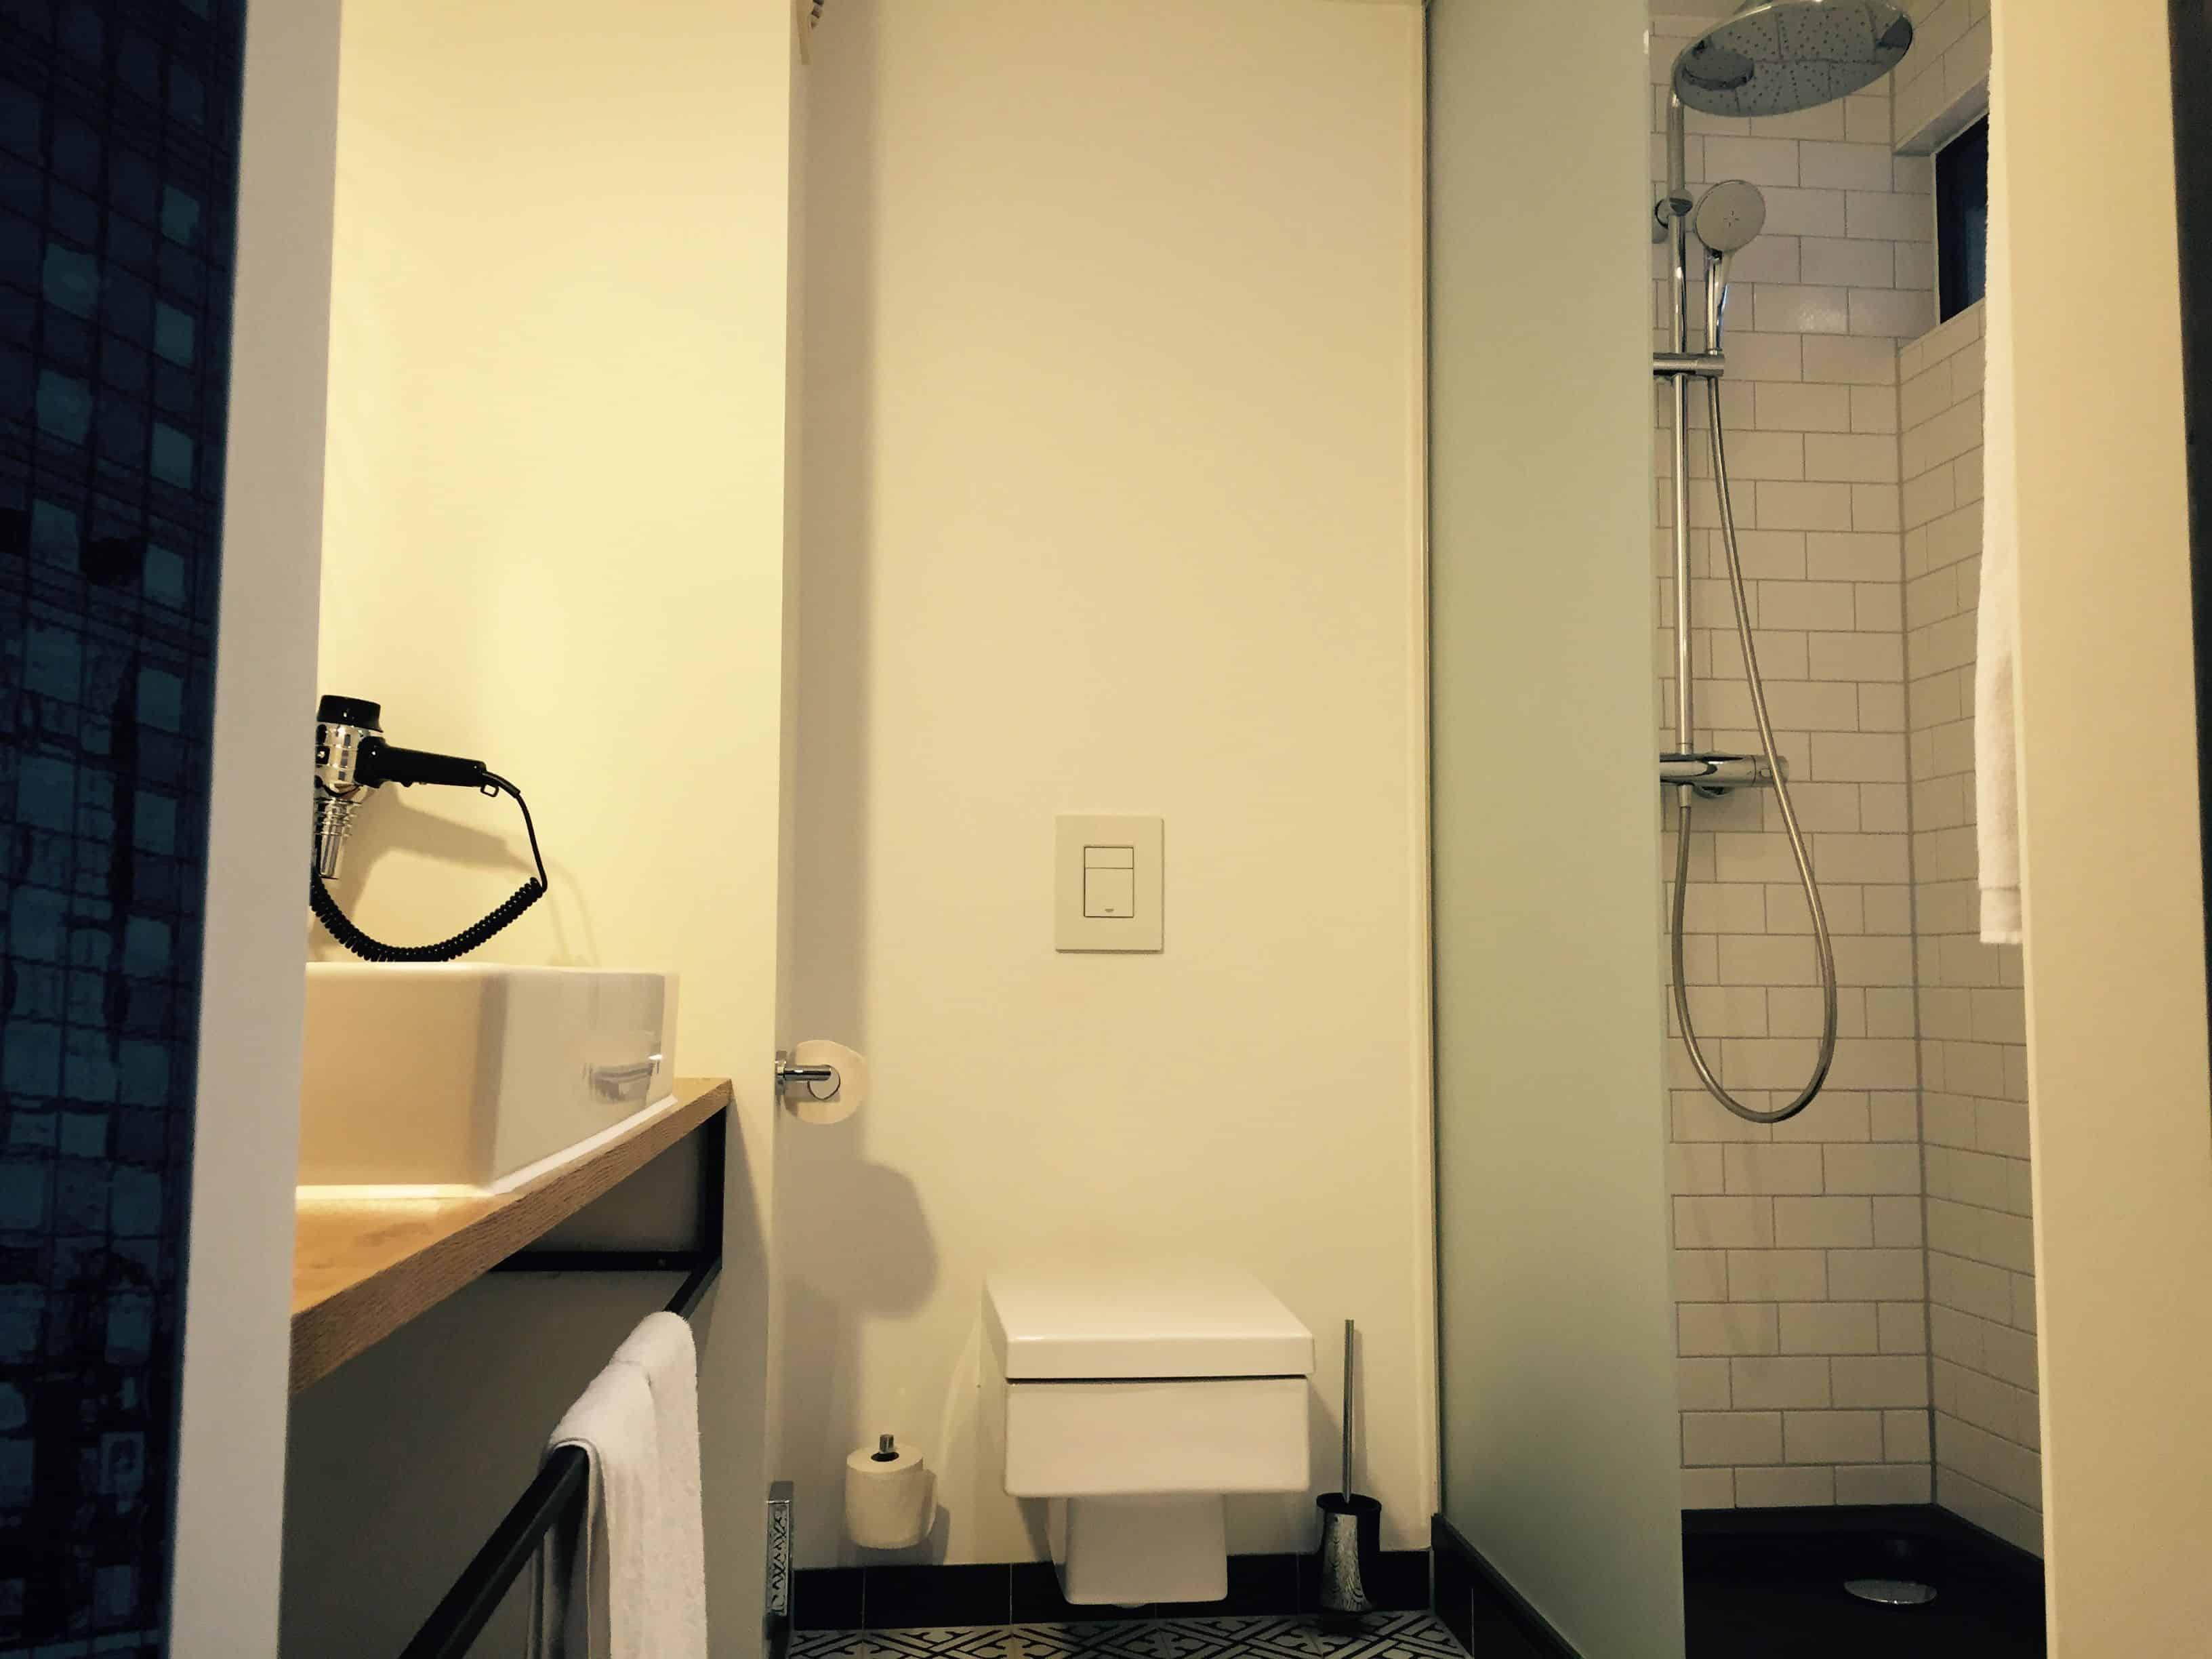 Modern industrial black and white bathroom